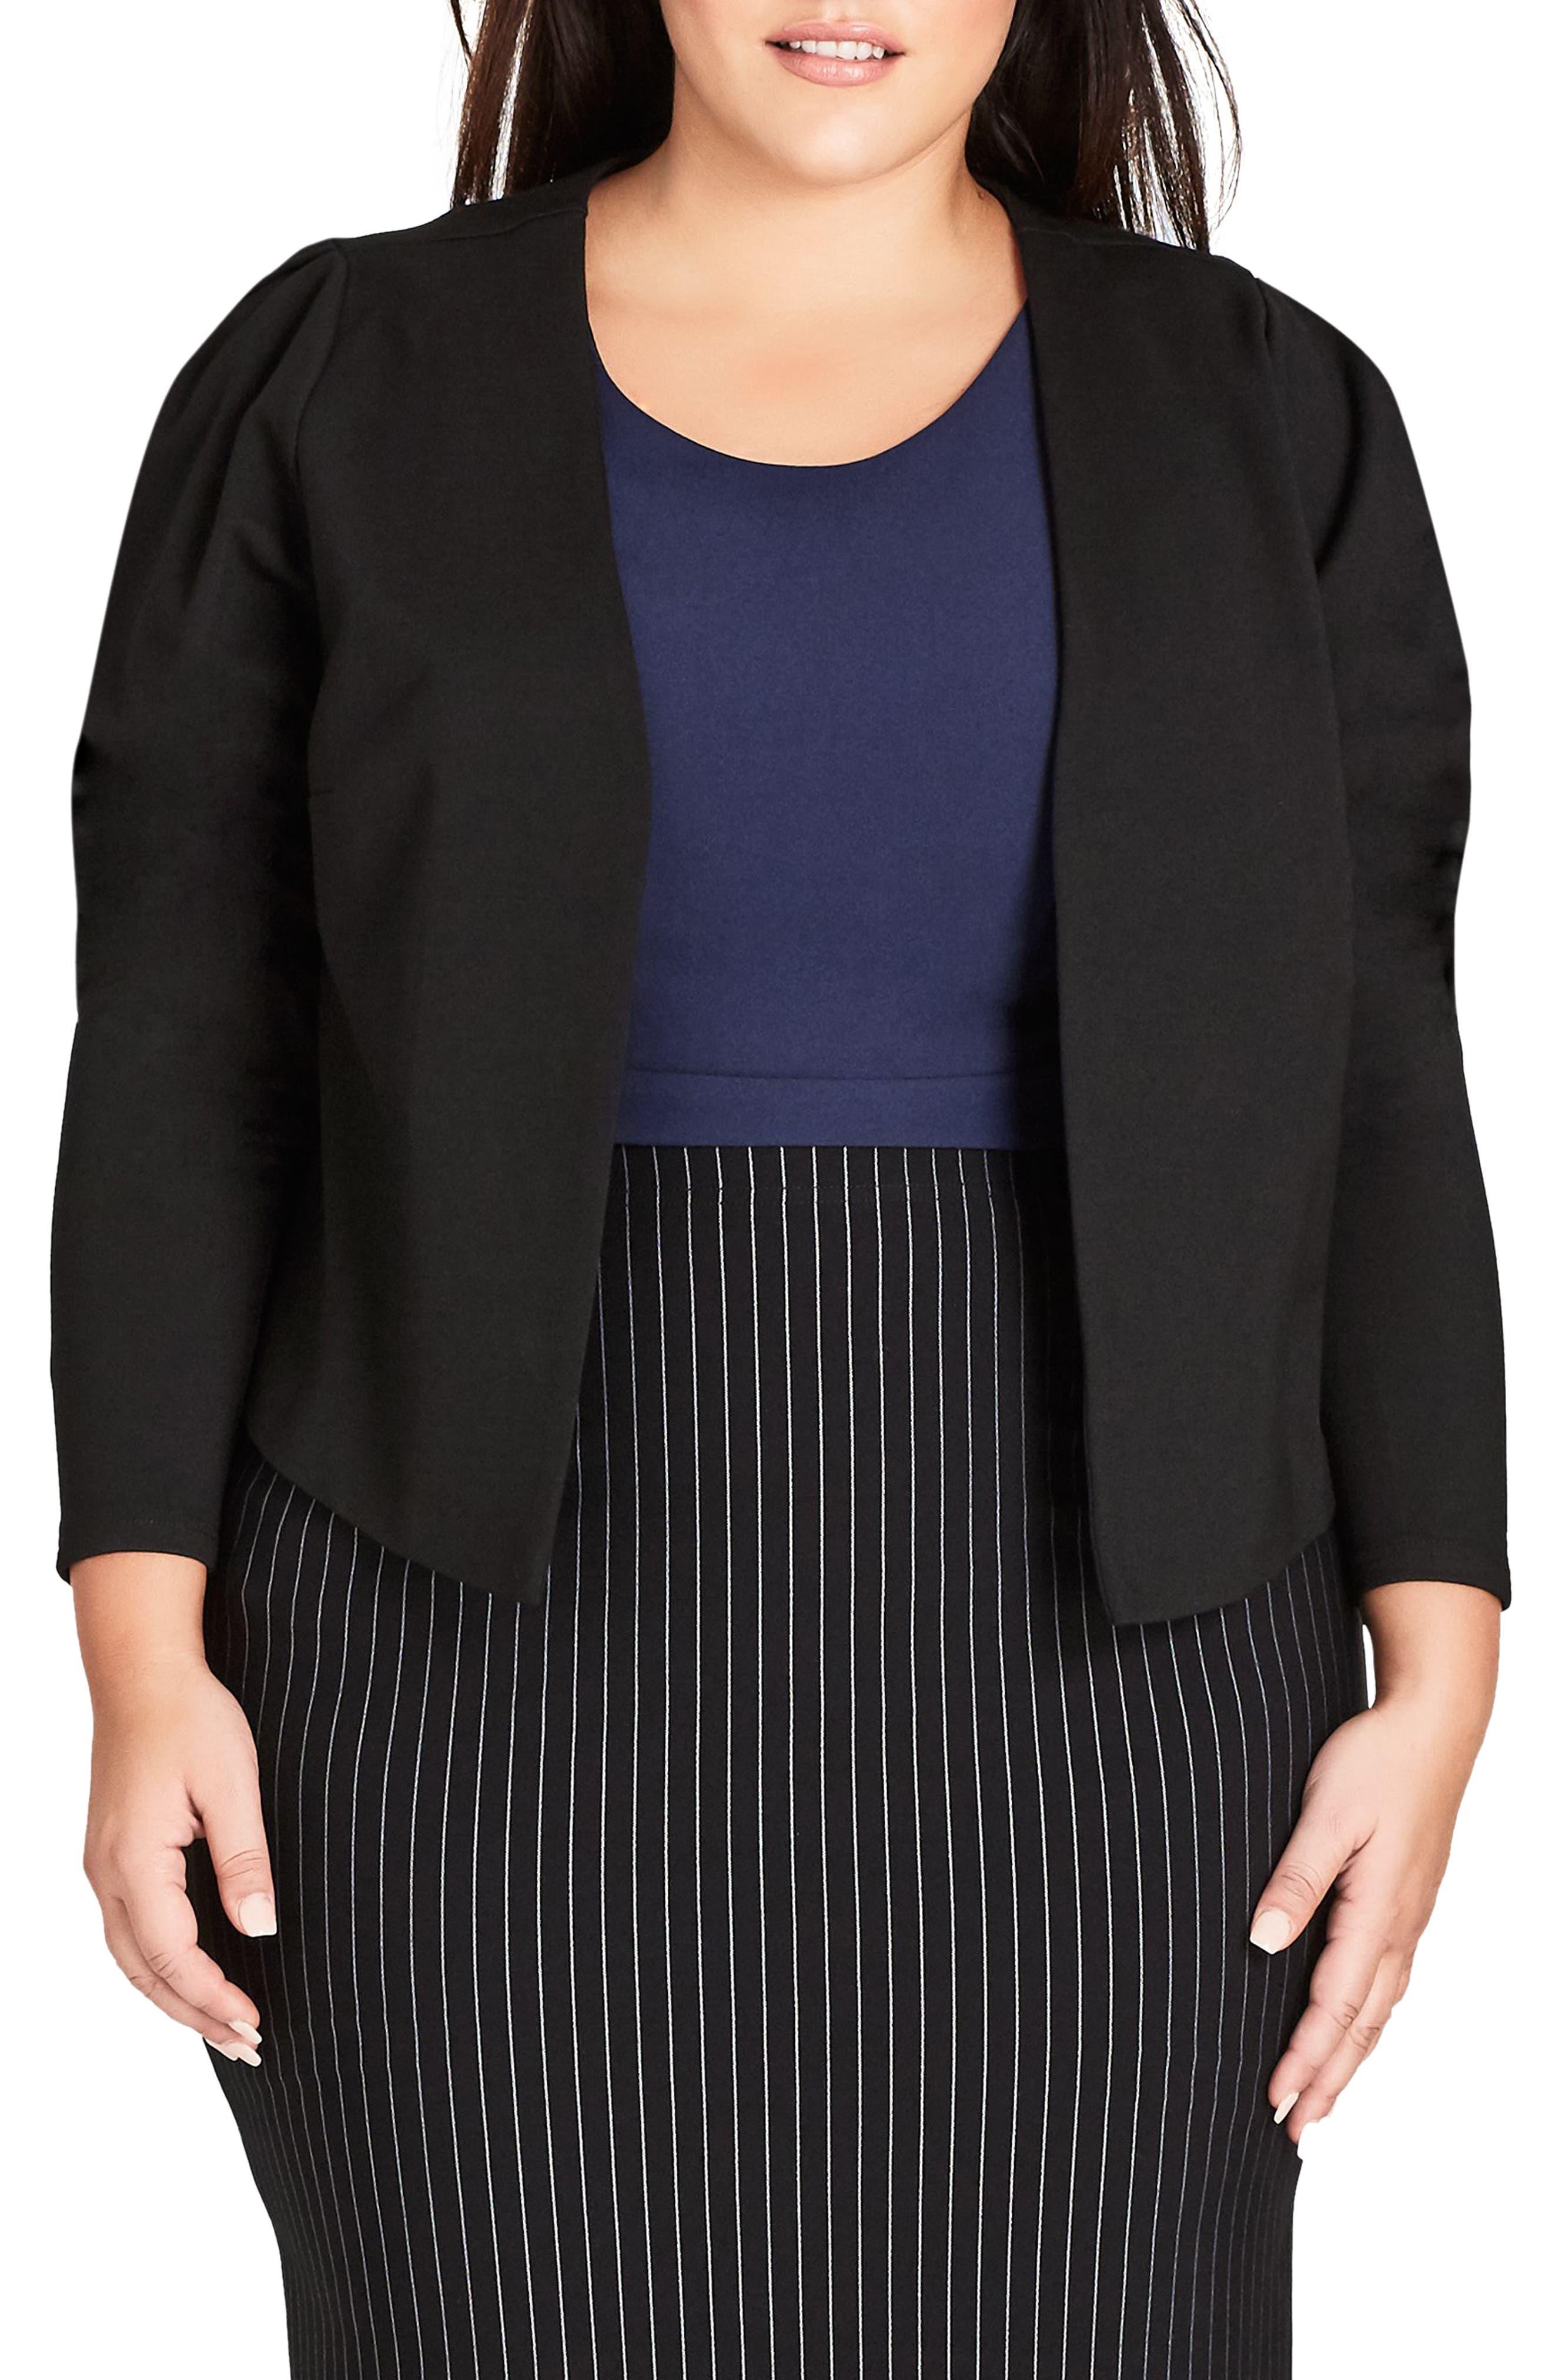 Office Fling Jacket,                             Main thumbnail 1, color,                             BLACK